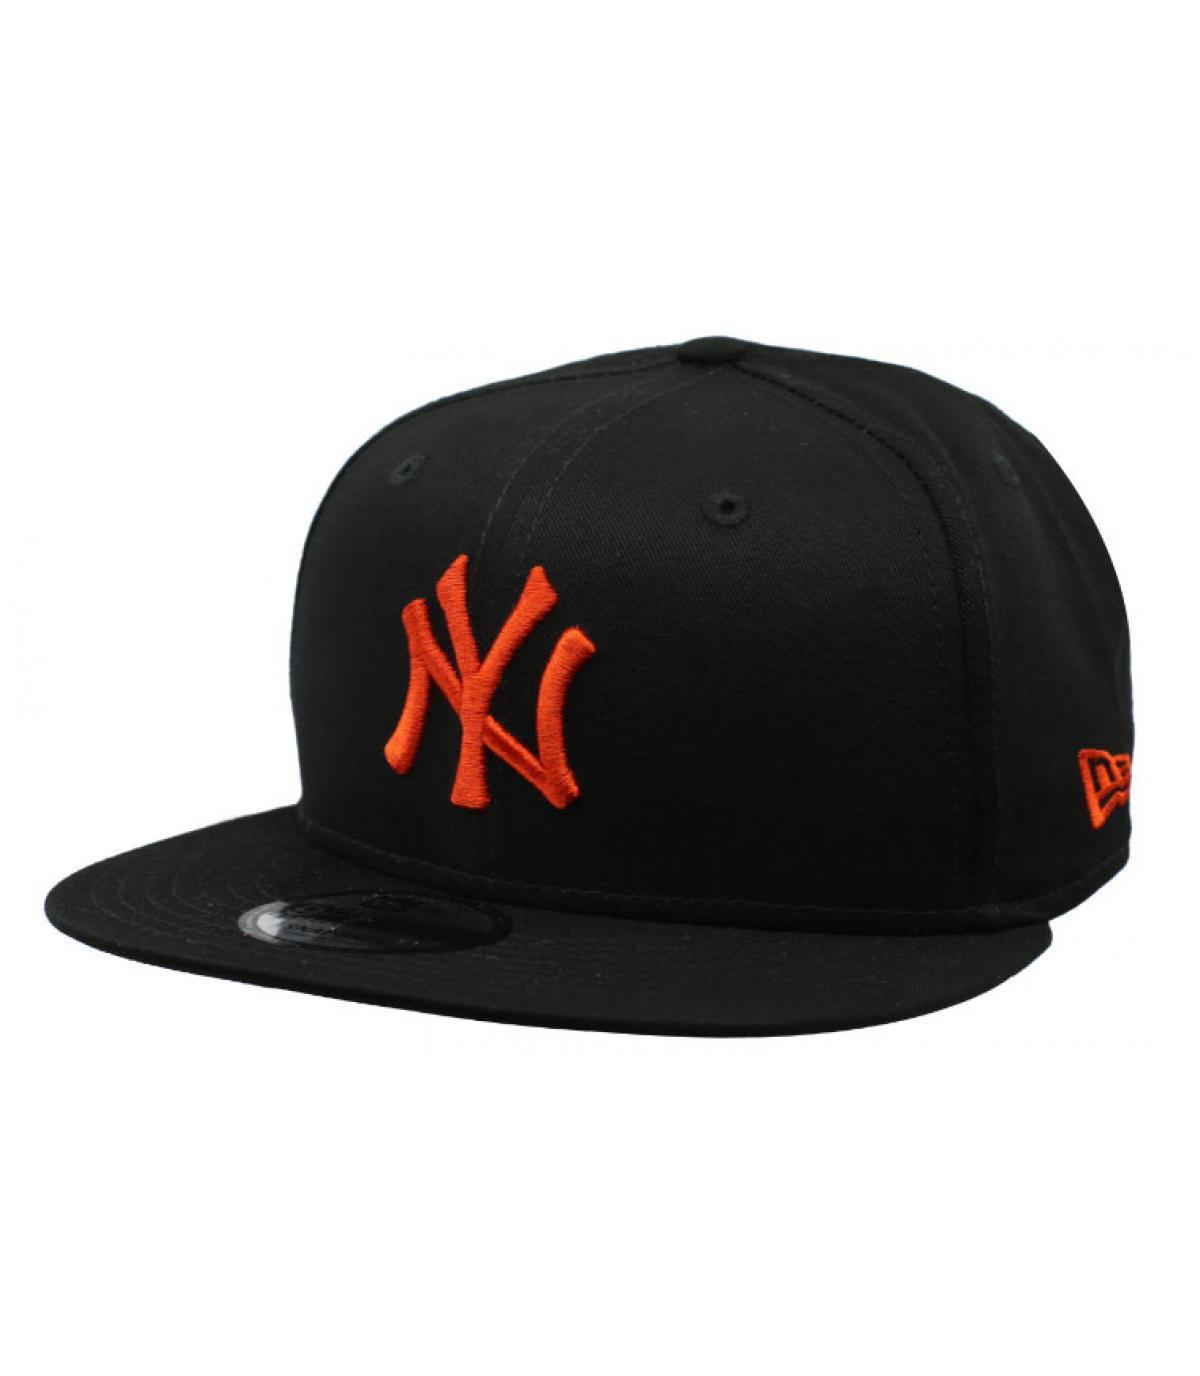 22f1d58e1 League Ess NY 9Fifty black orange